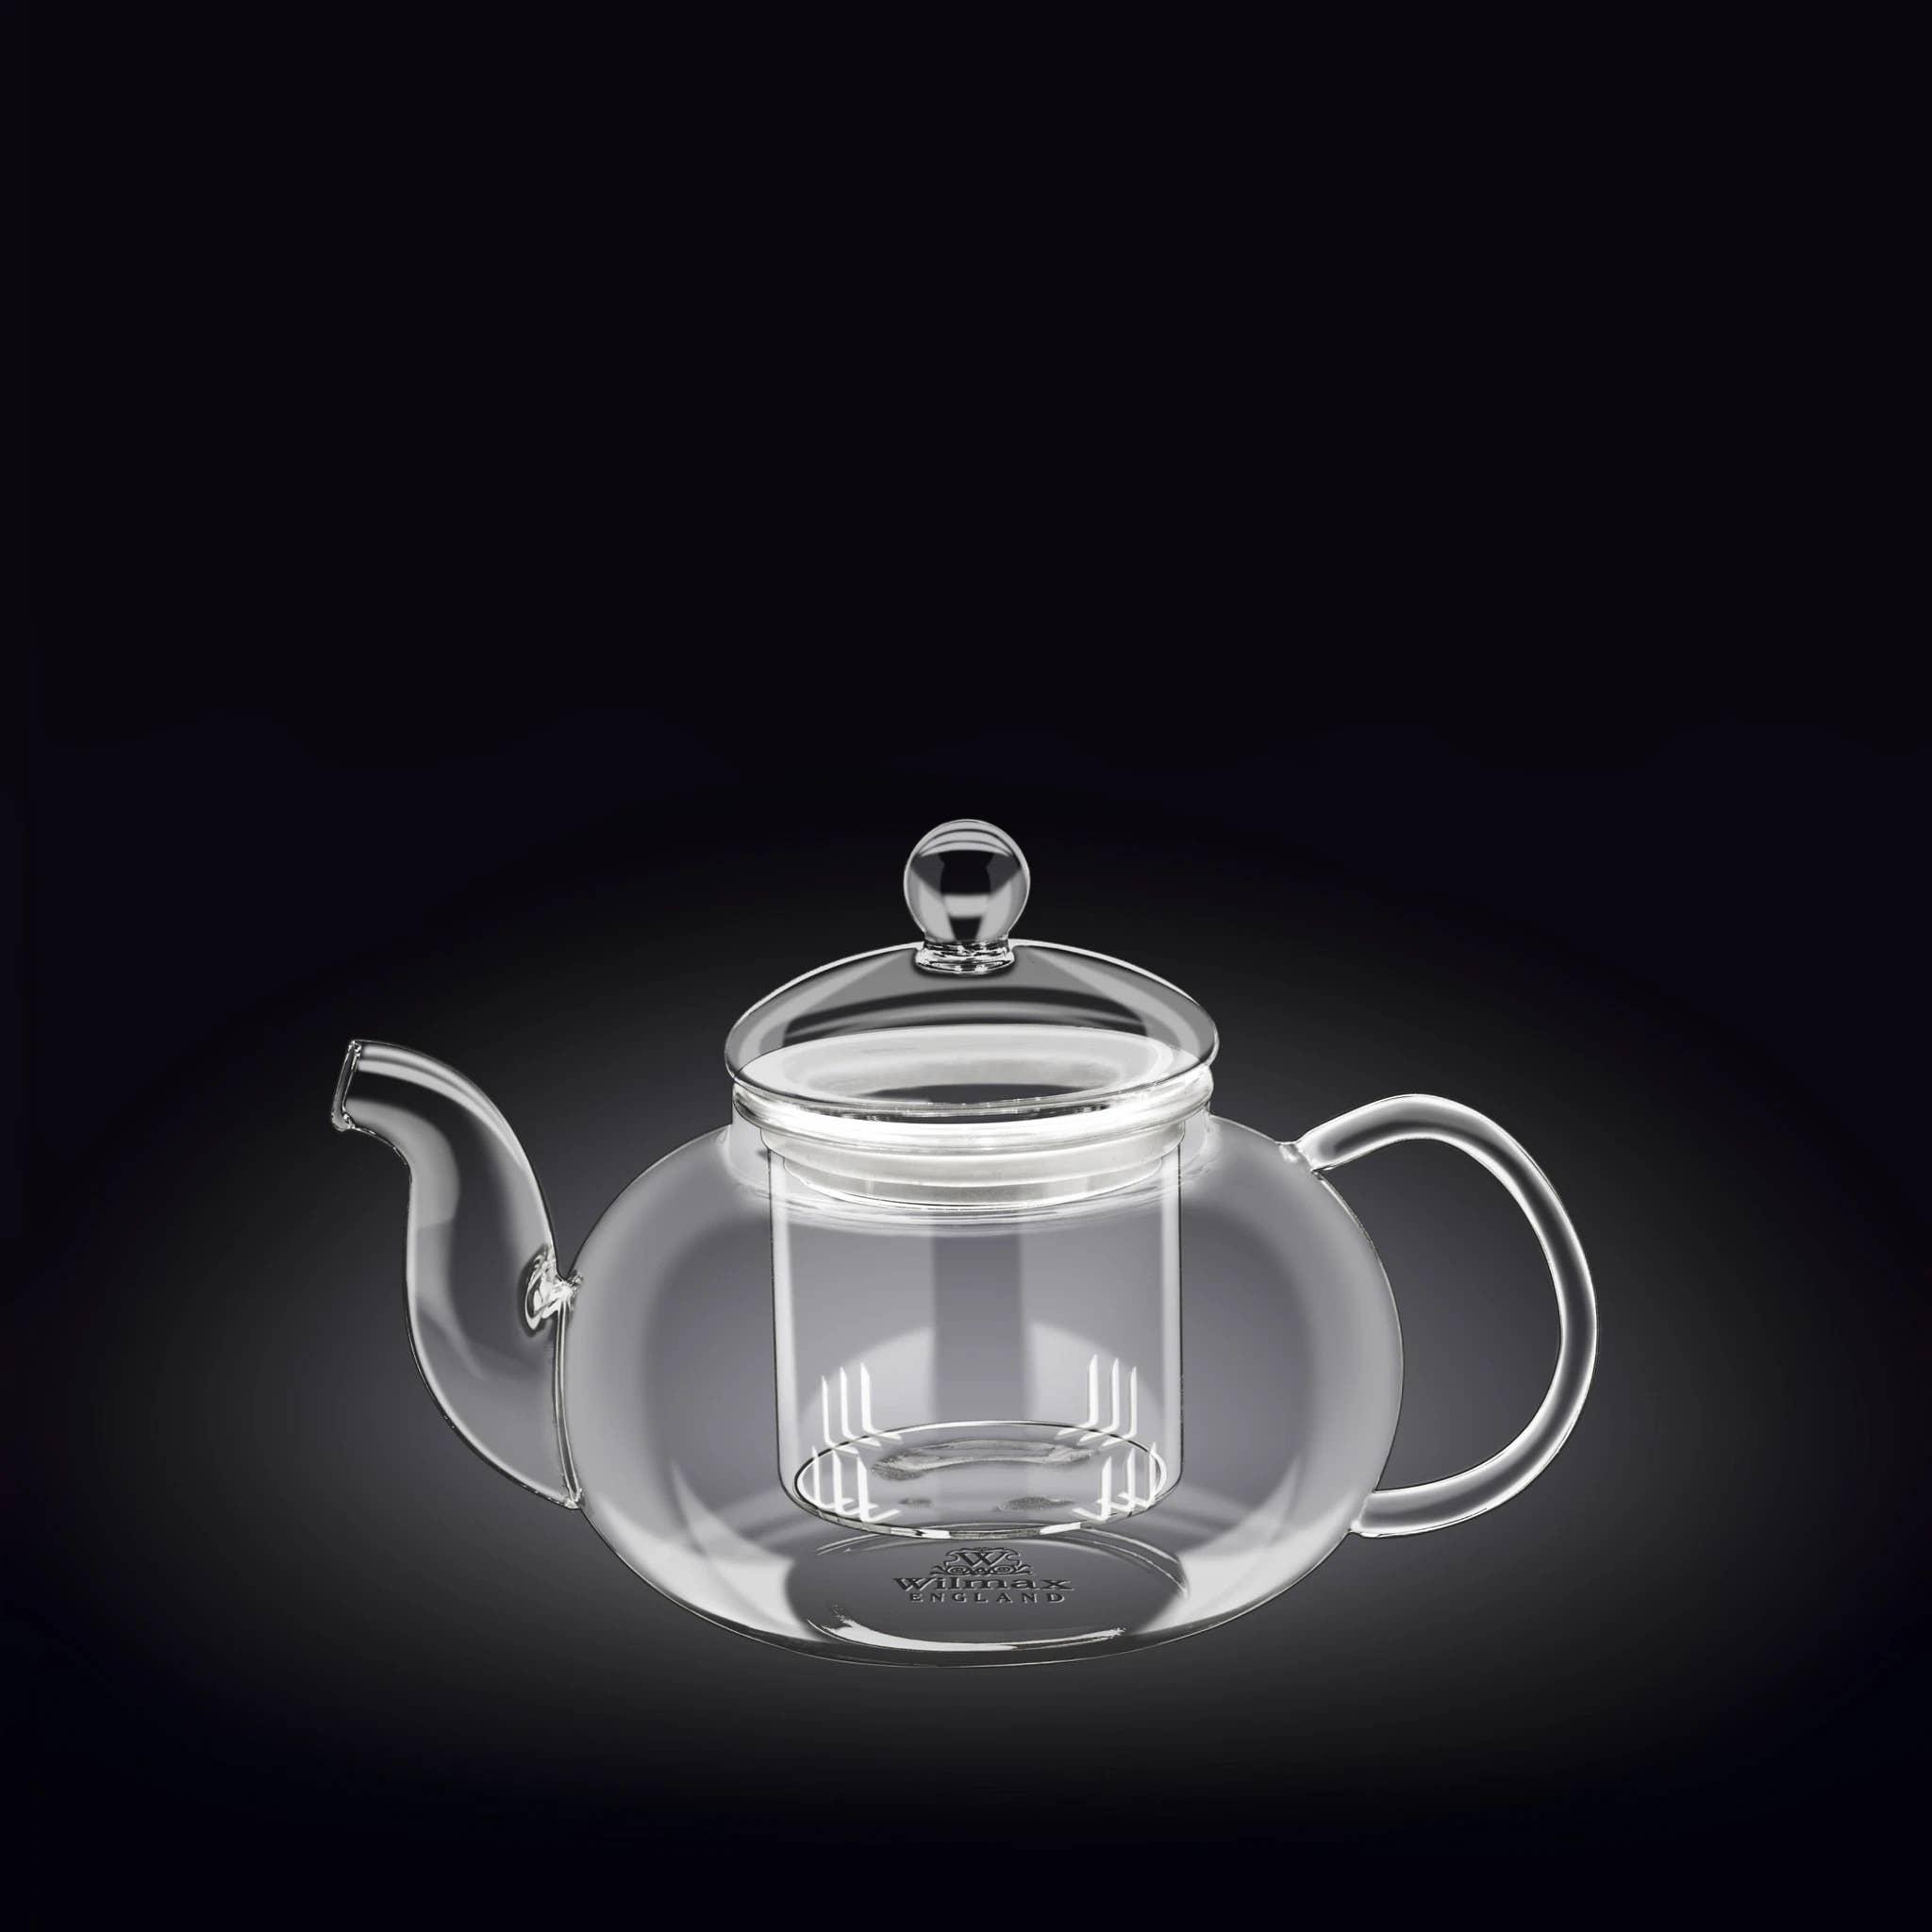 20 Fl oz Thermo Glass Tea Pot - WL-888812 / A   Trada Marketplace